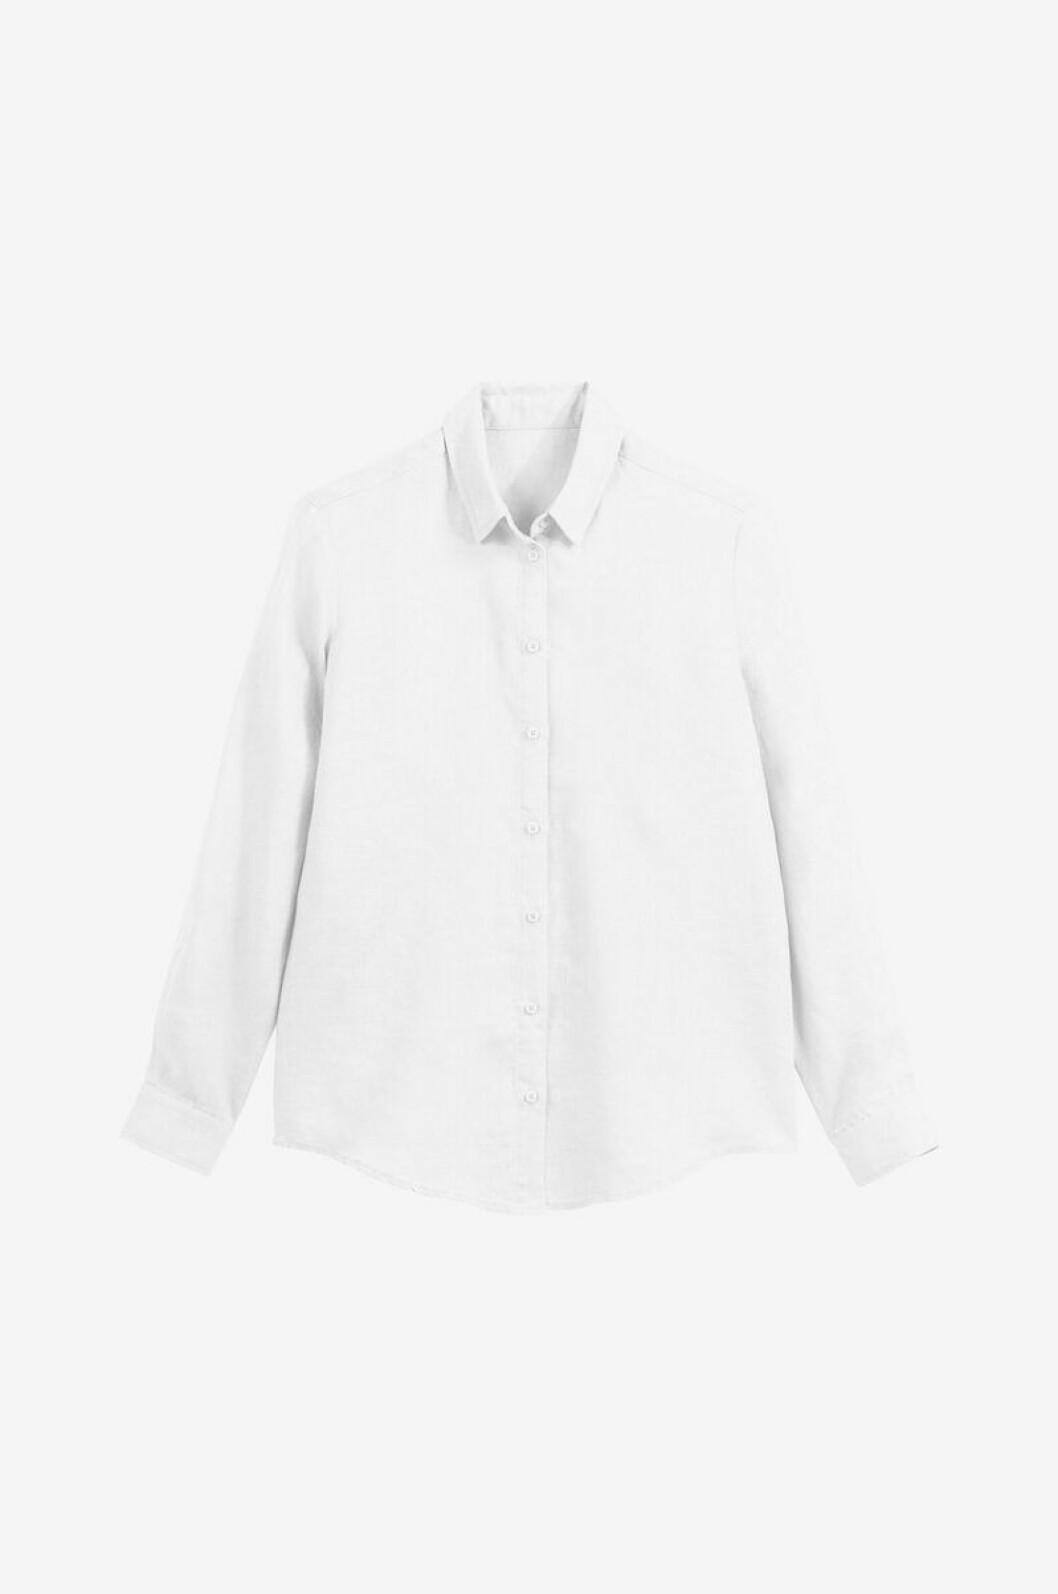 Vit skjorta i linne